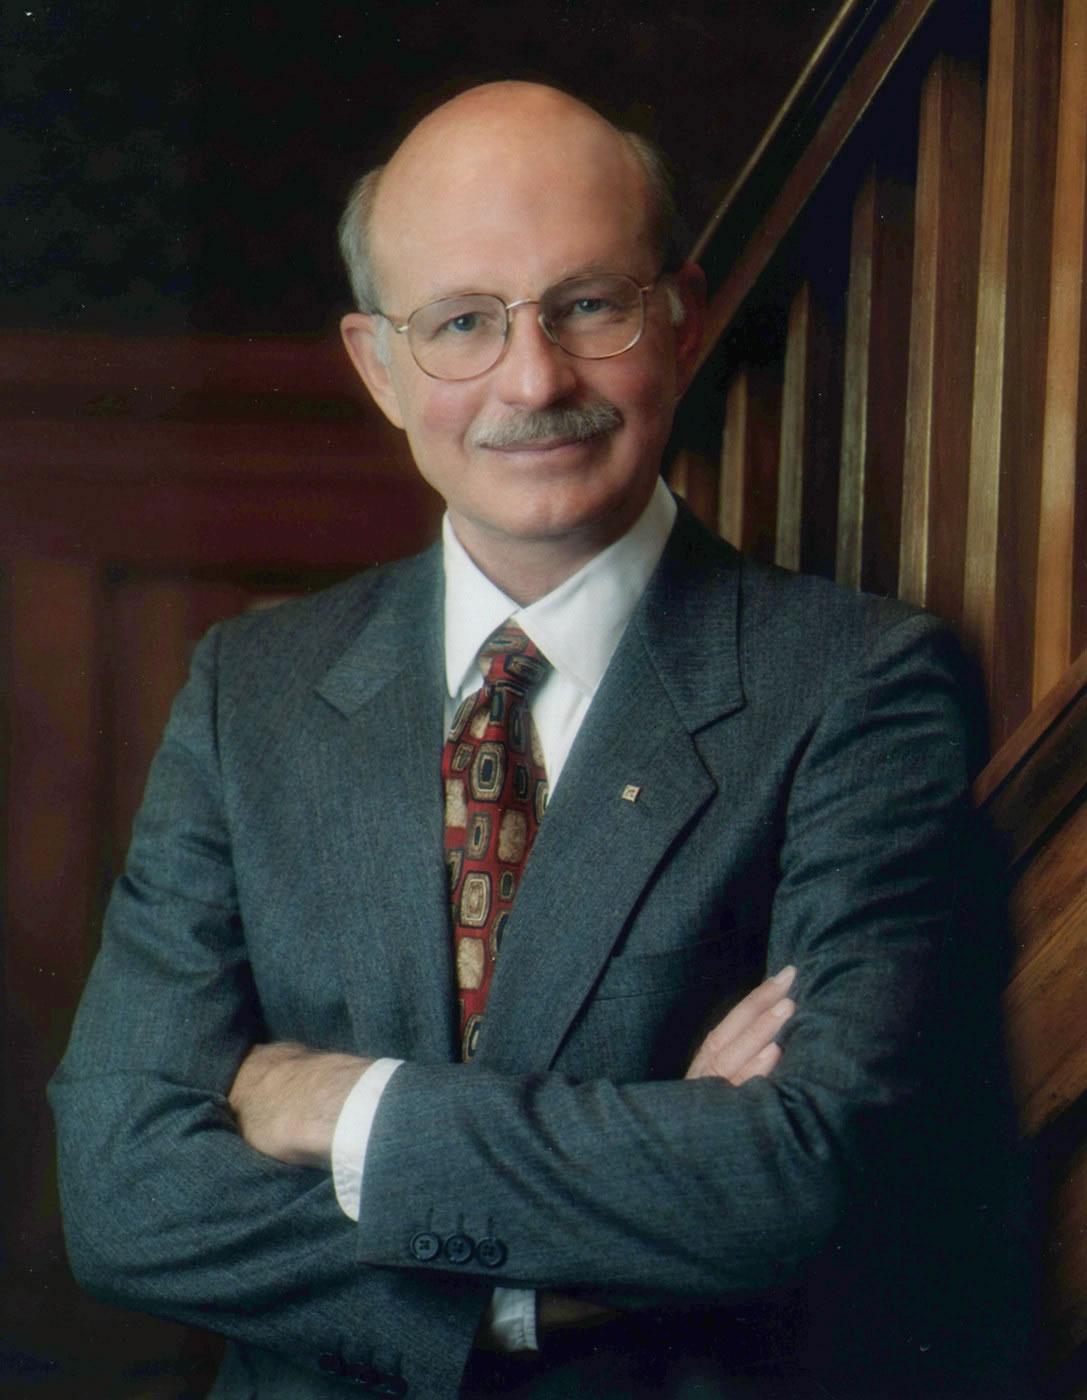 Distinguished Professor Gerald Stringfellow, 2004 Rosenblatt Prize Recipient